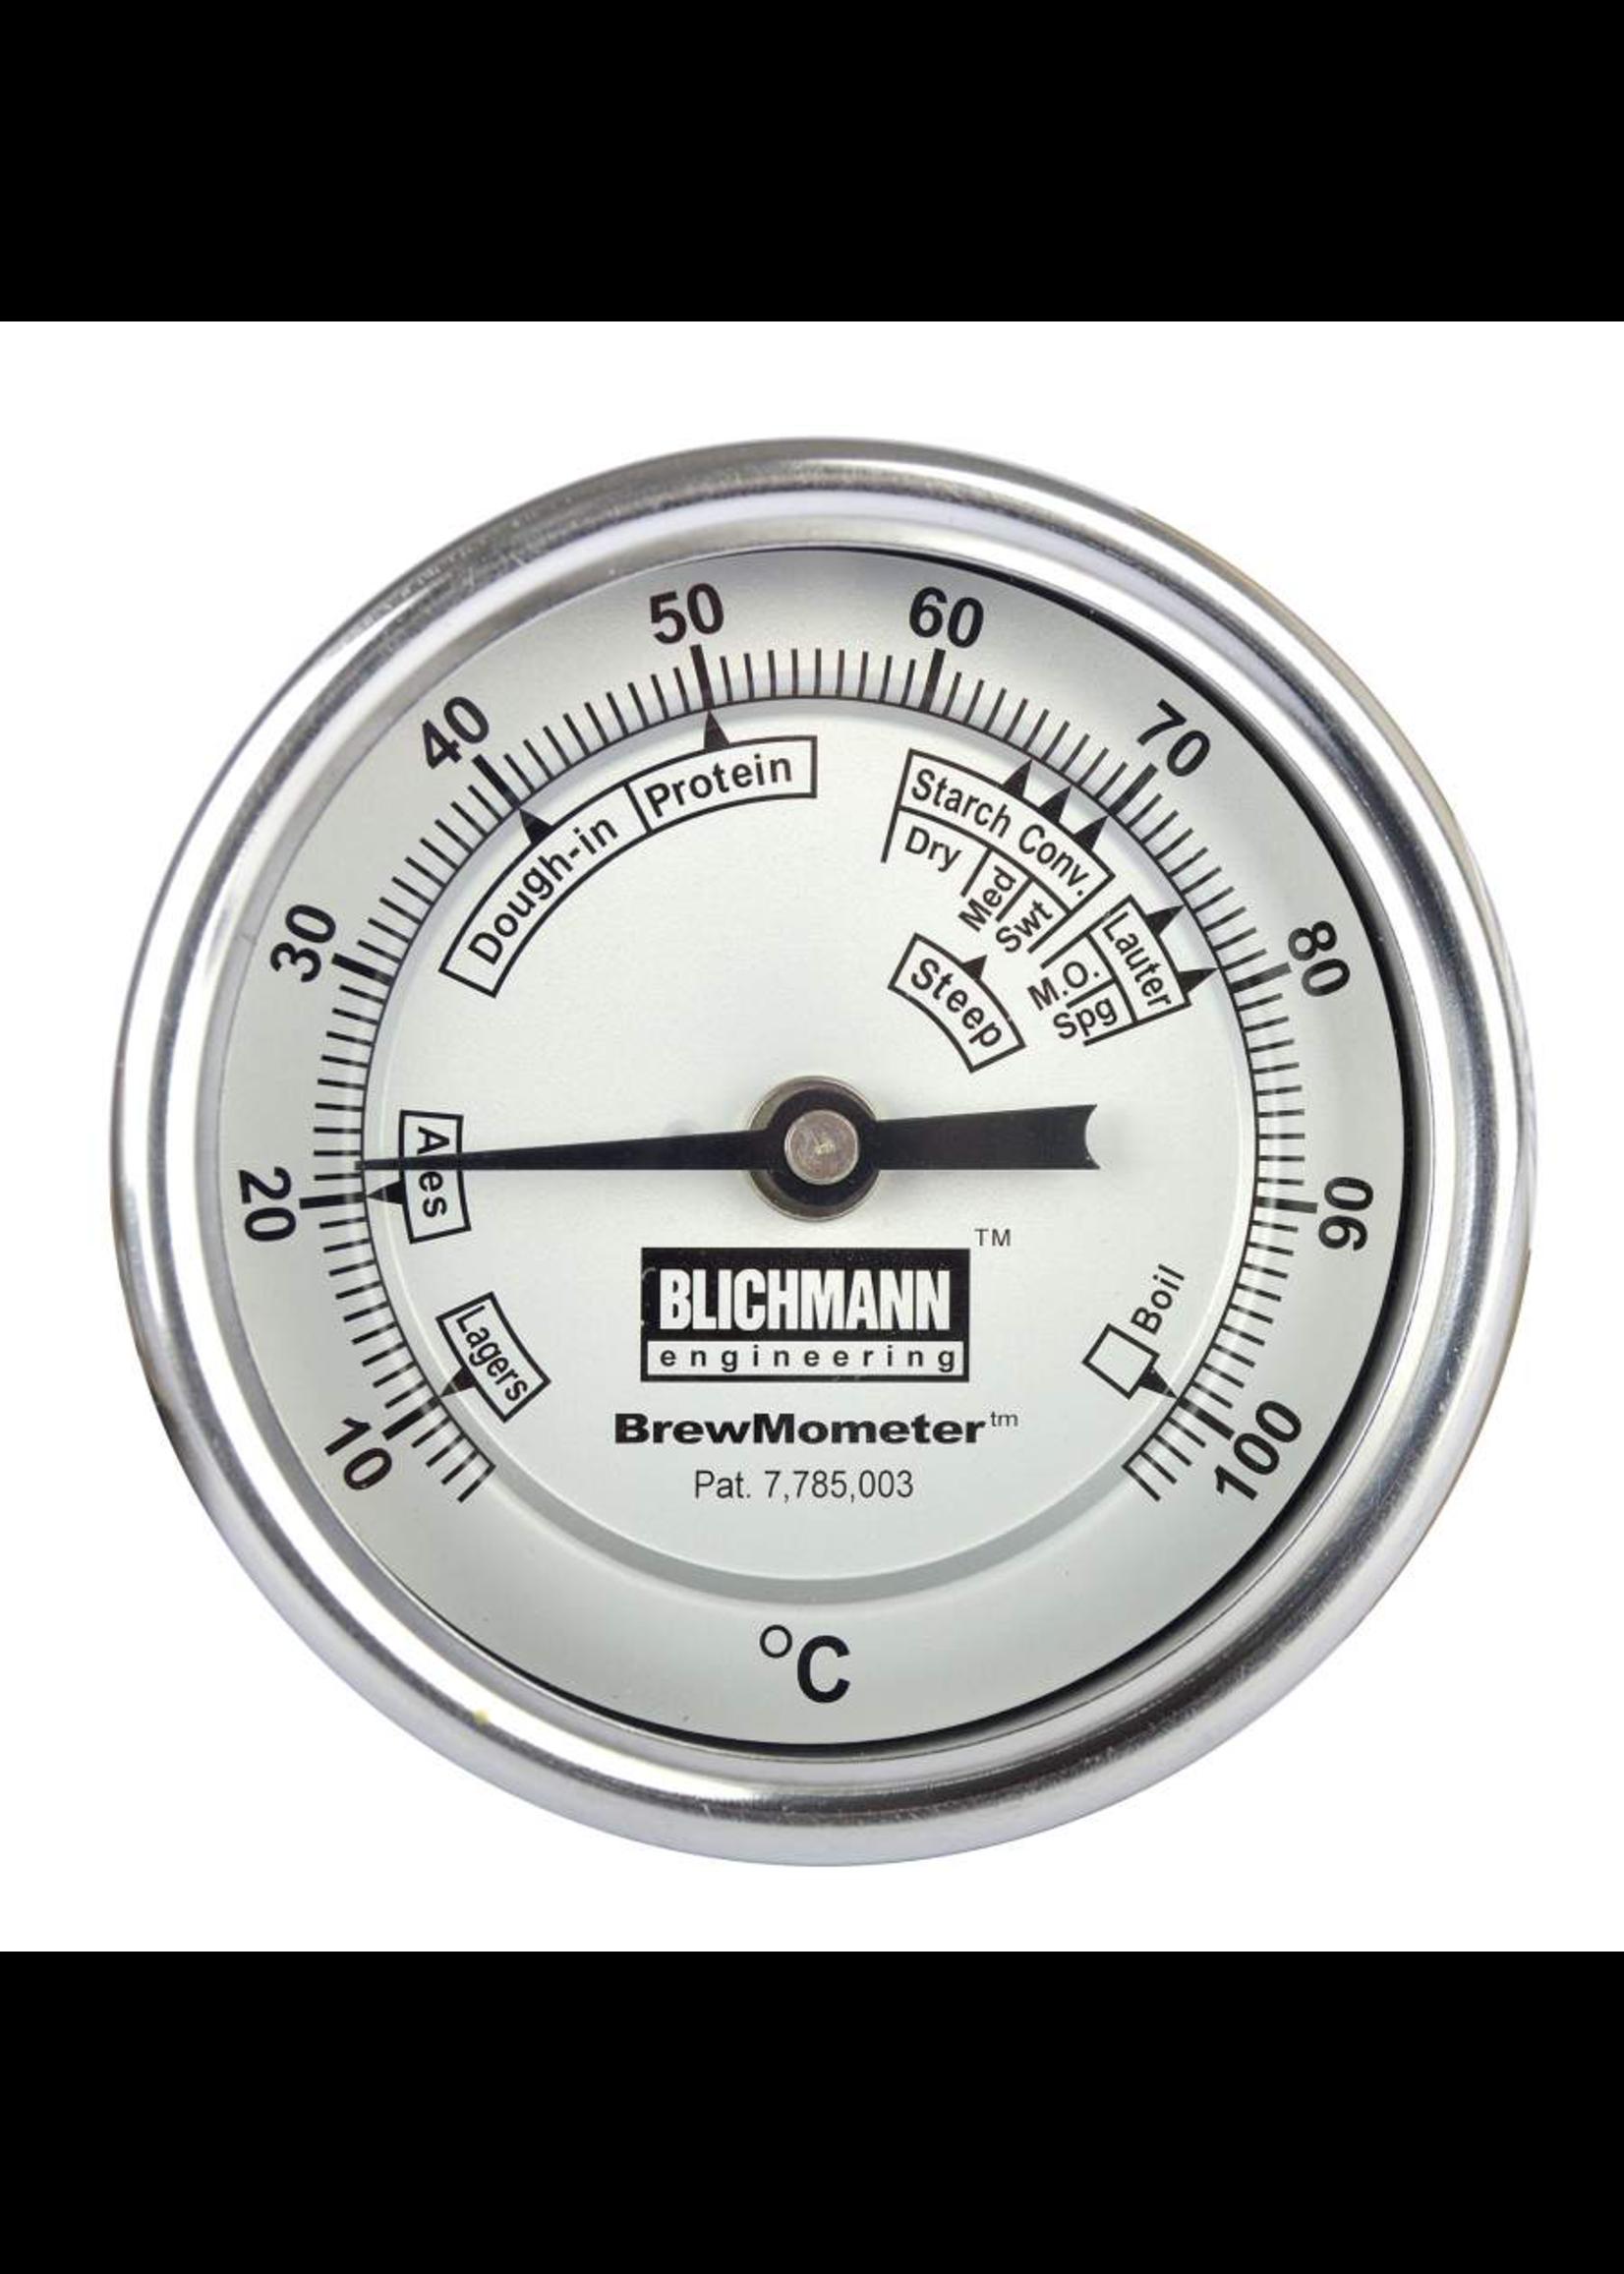 Blichmann Blichmann BrewMometer - Fixed Angle Weldless (Celsius)